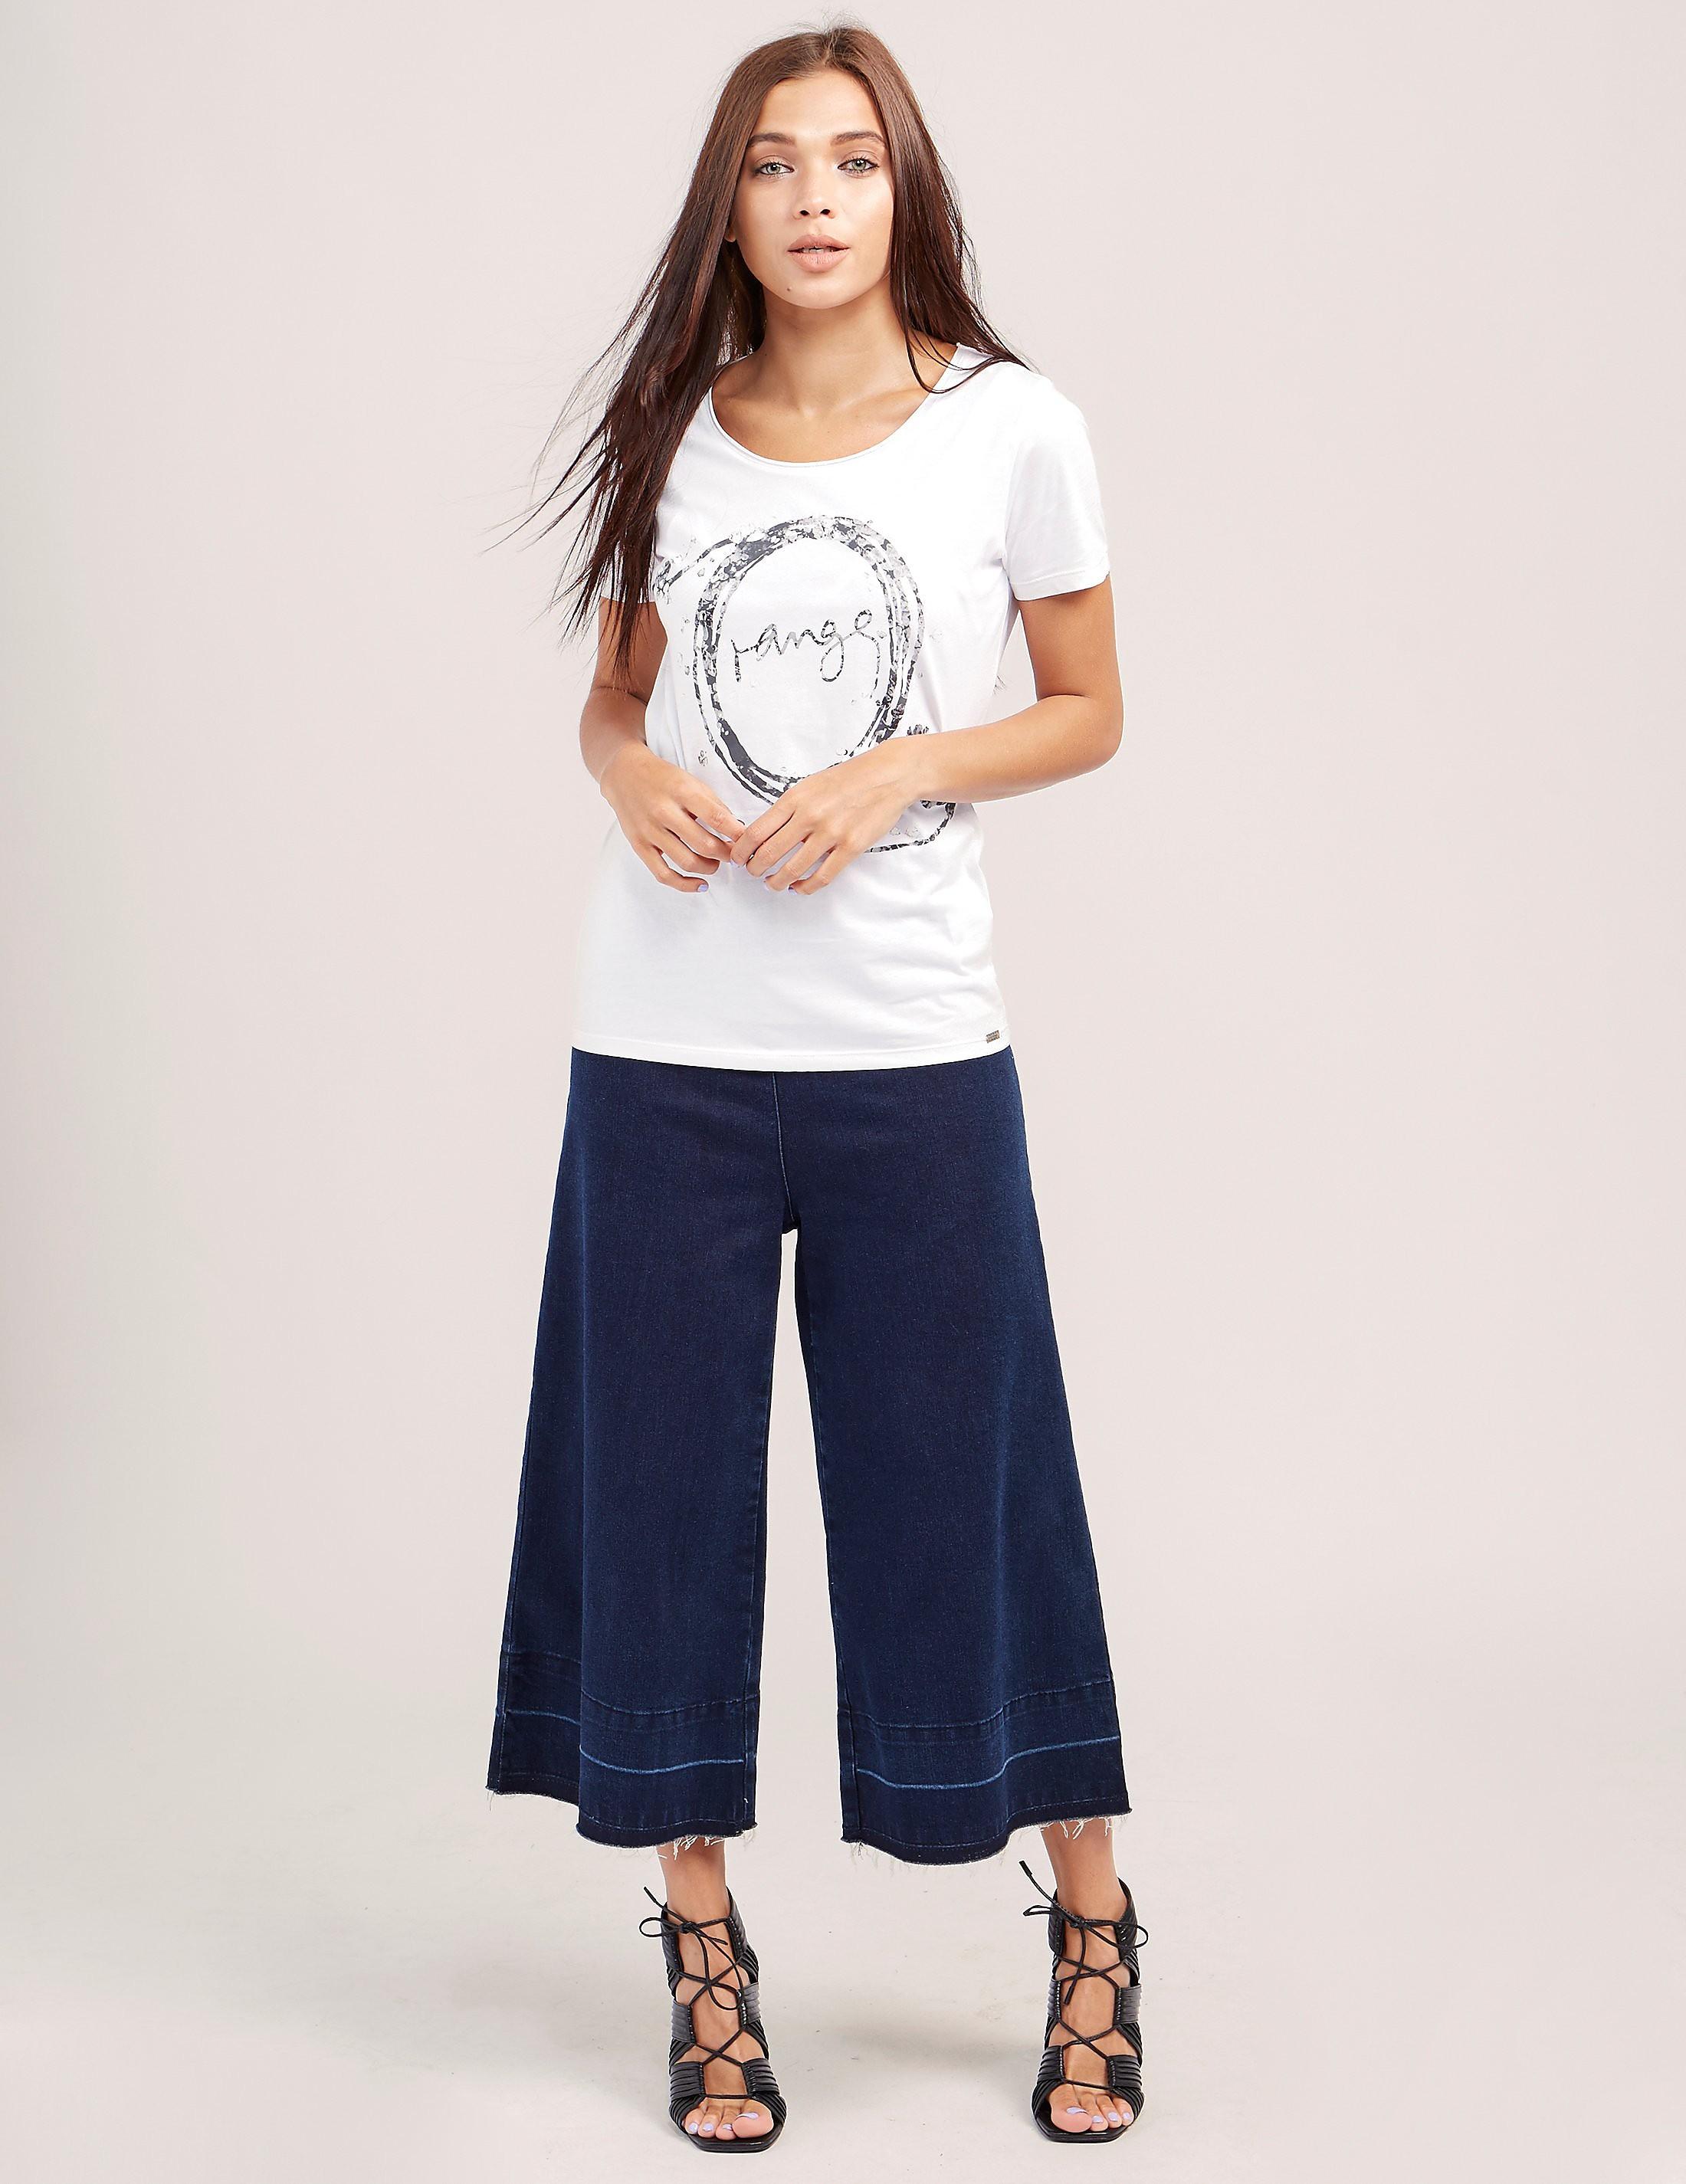 BOSS Orange Printed Short Sleeve T-Shirt